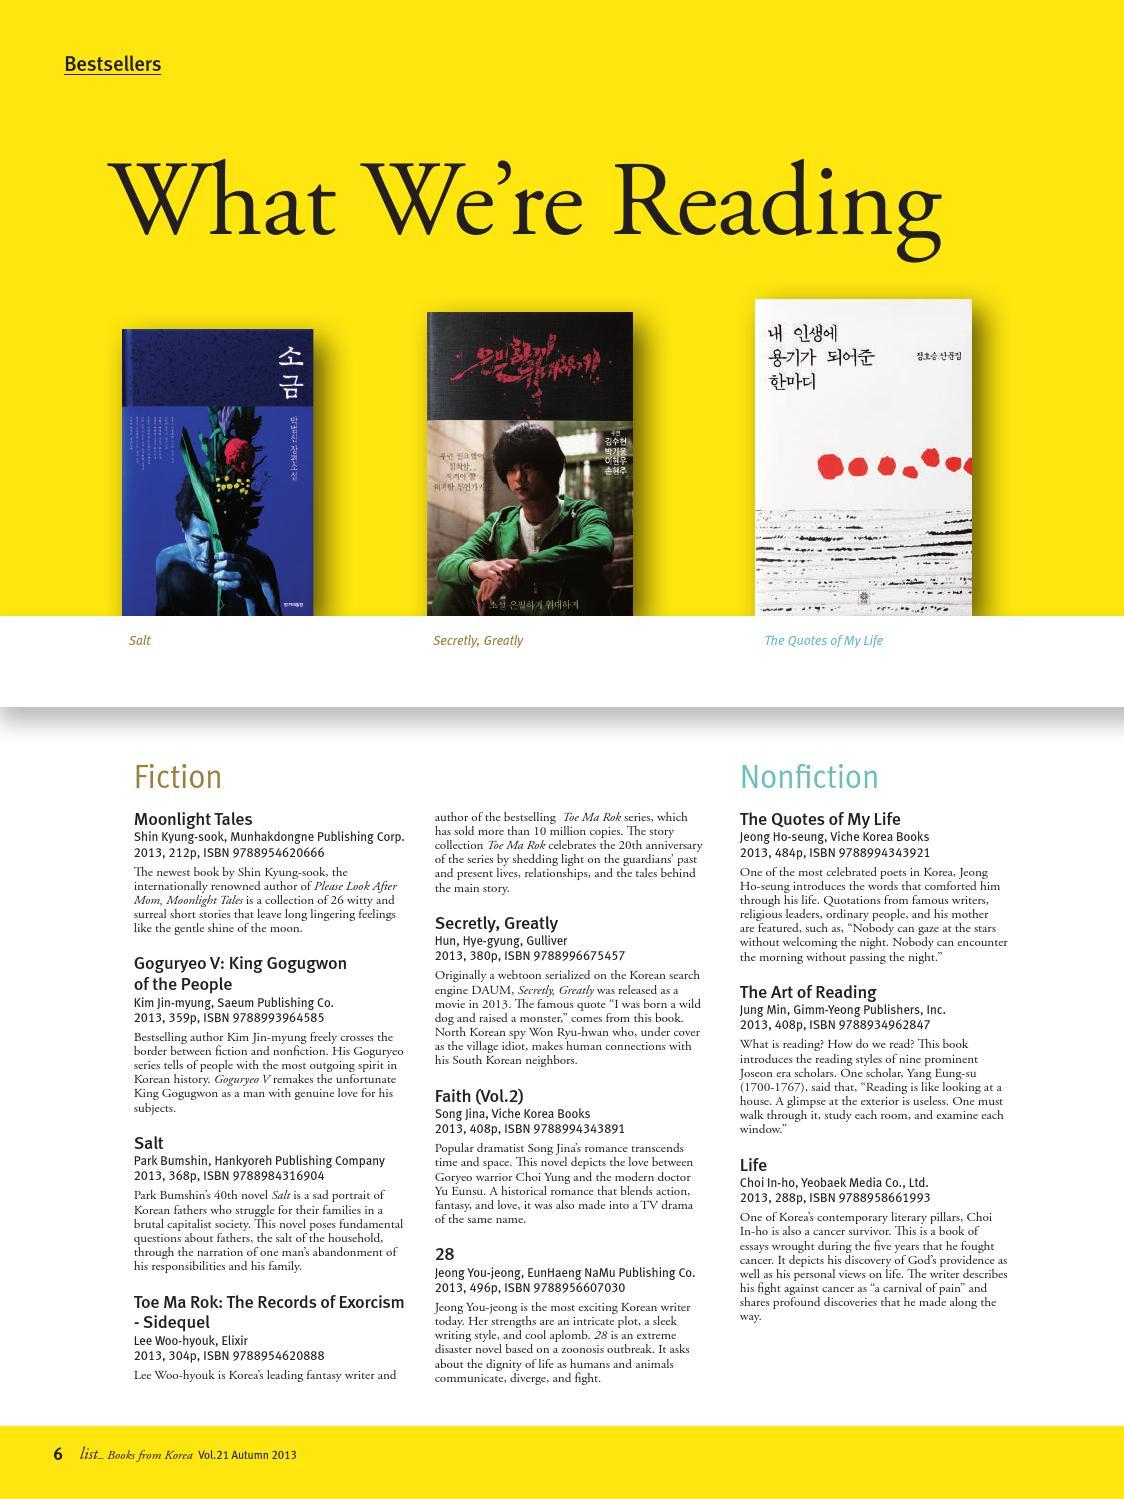 list: Books from Korea] Vol 21 Autumn 2013 by LTI Korea